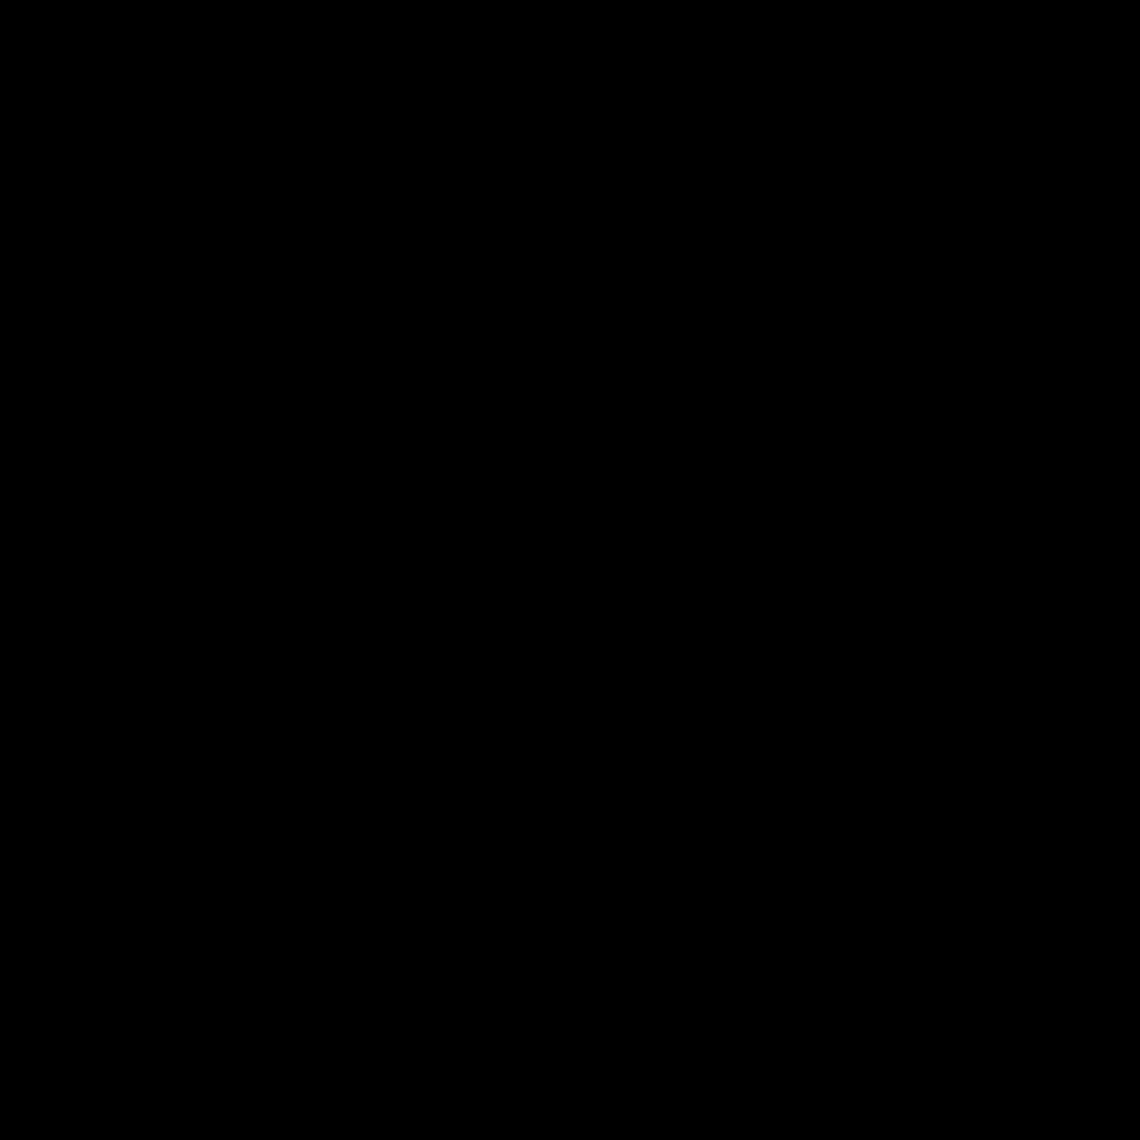 Wood-Plain-02-Metallic